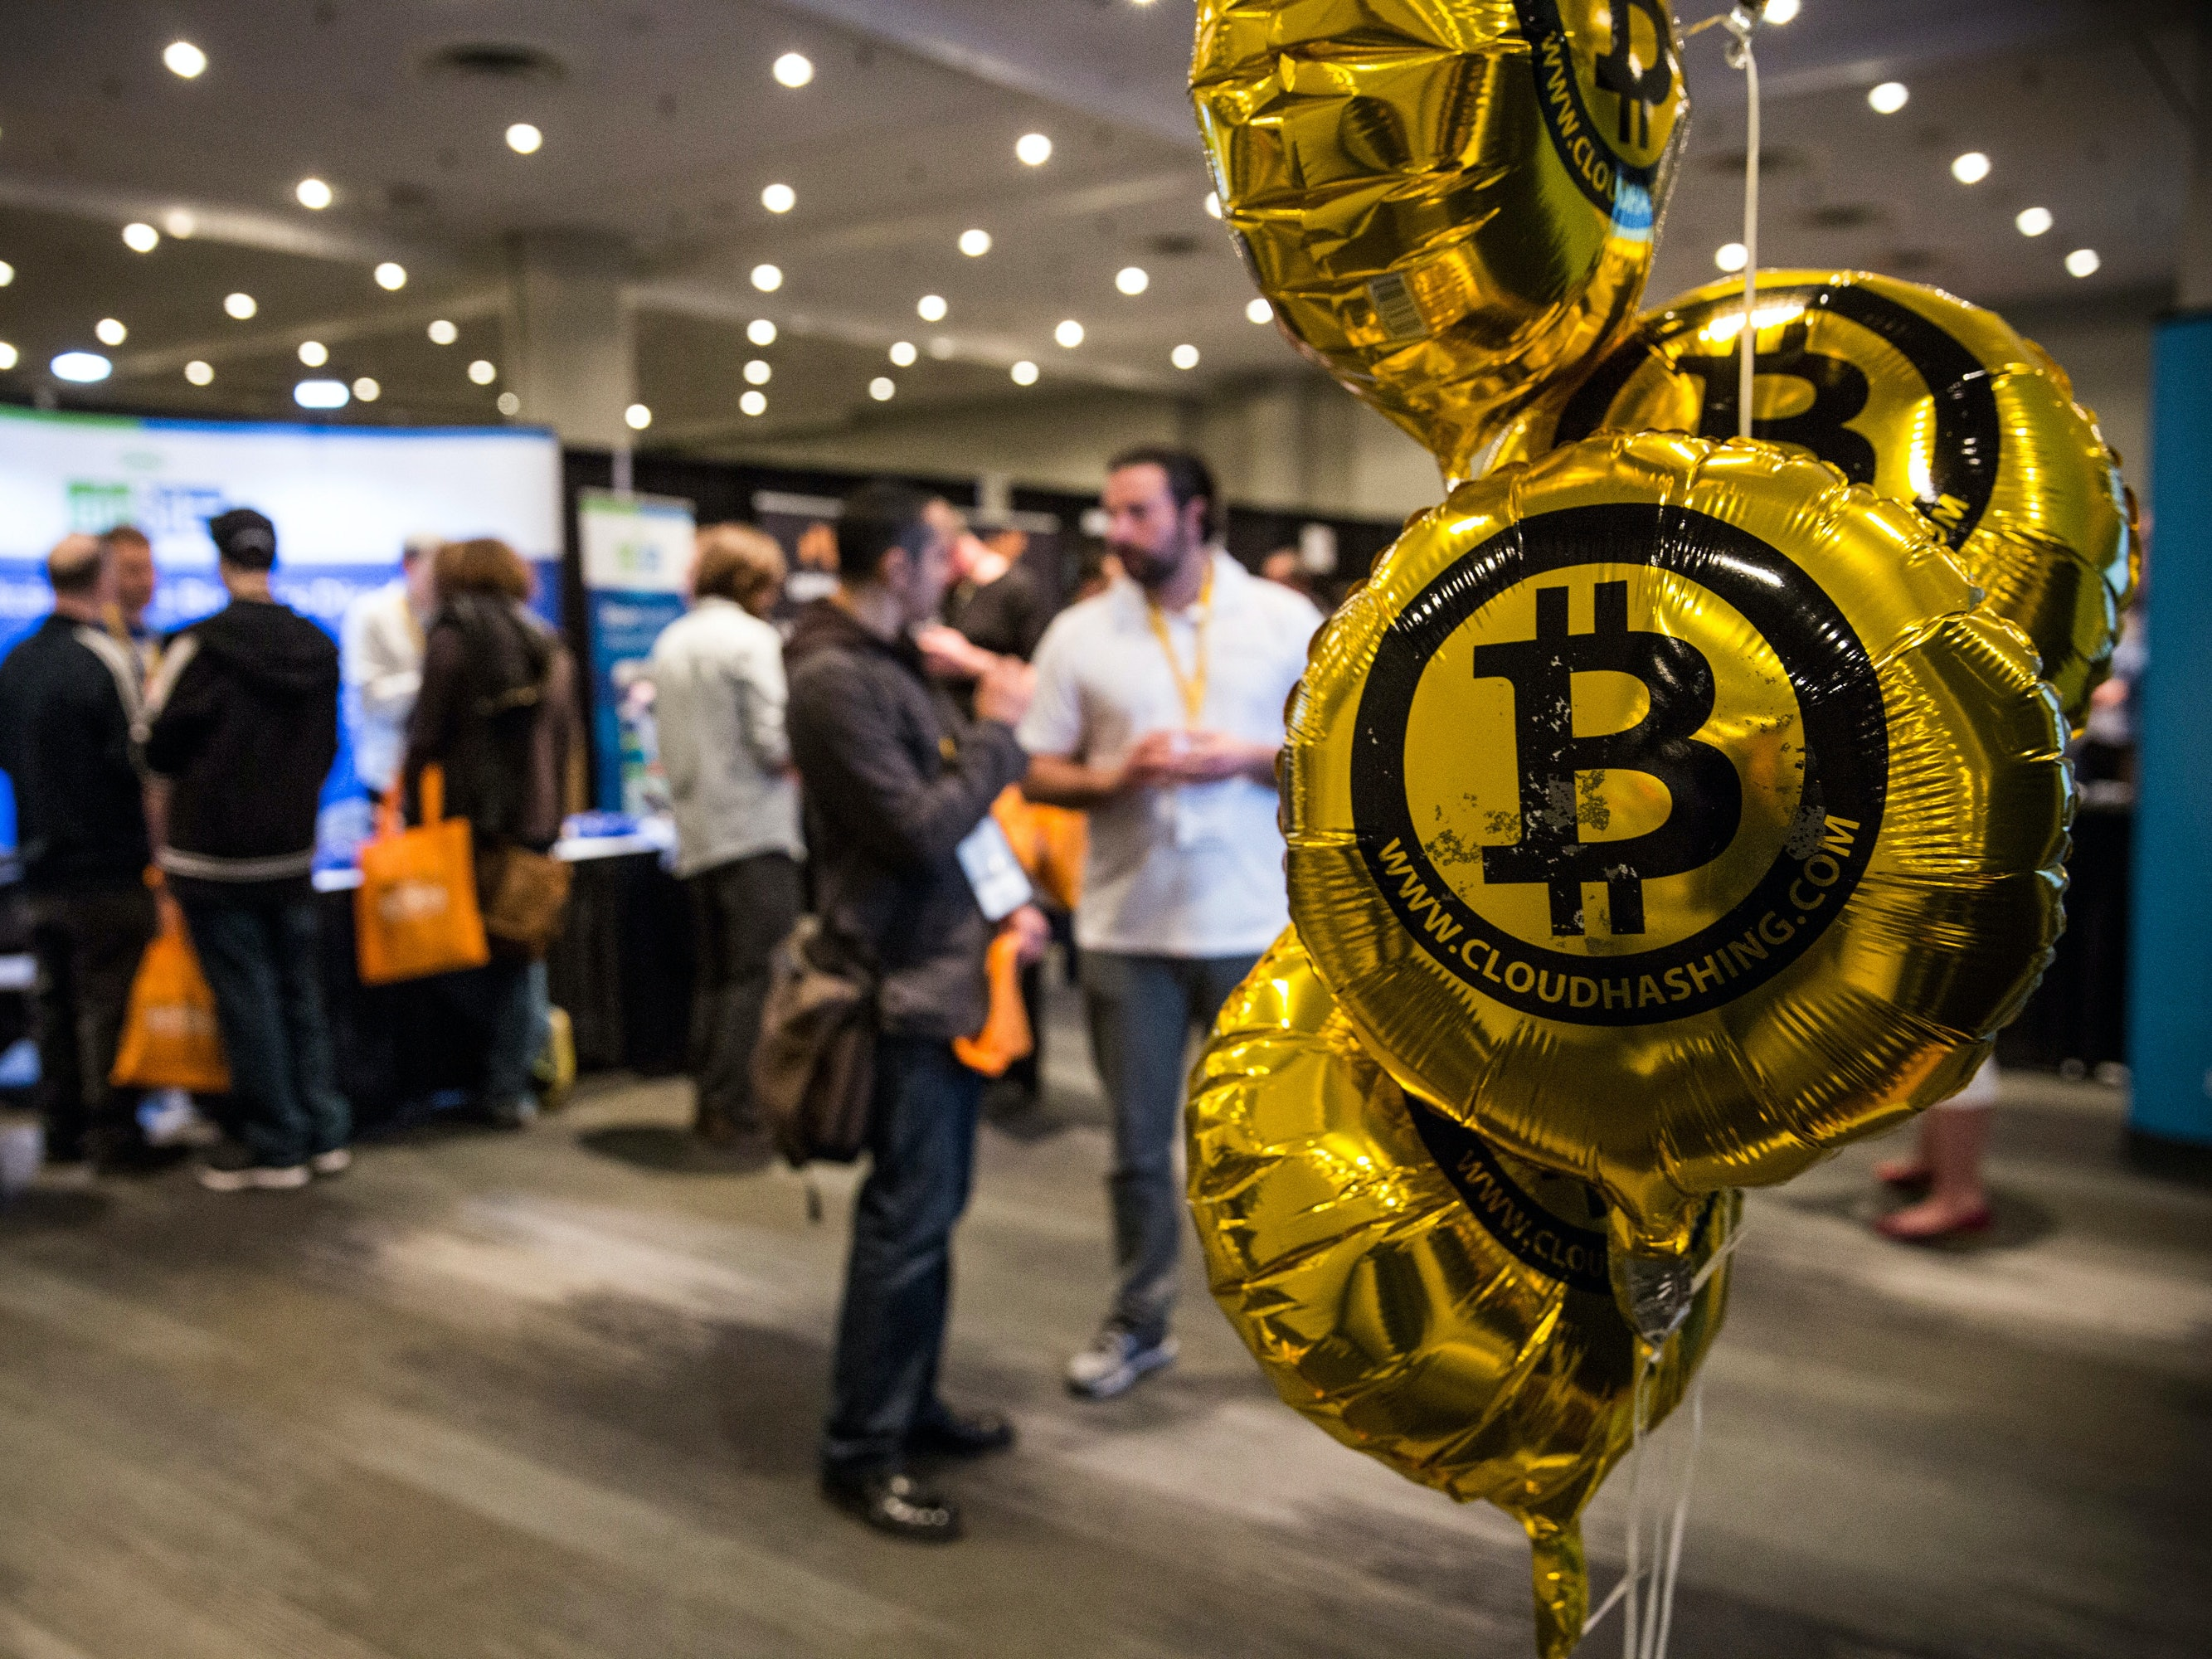 Why Did Claimed Bitcoin Creator Craig Wright Choose the Pseudonym Satoshi Nakamoto?